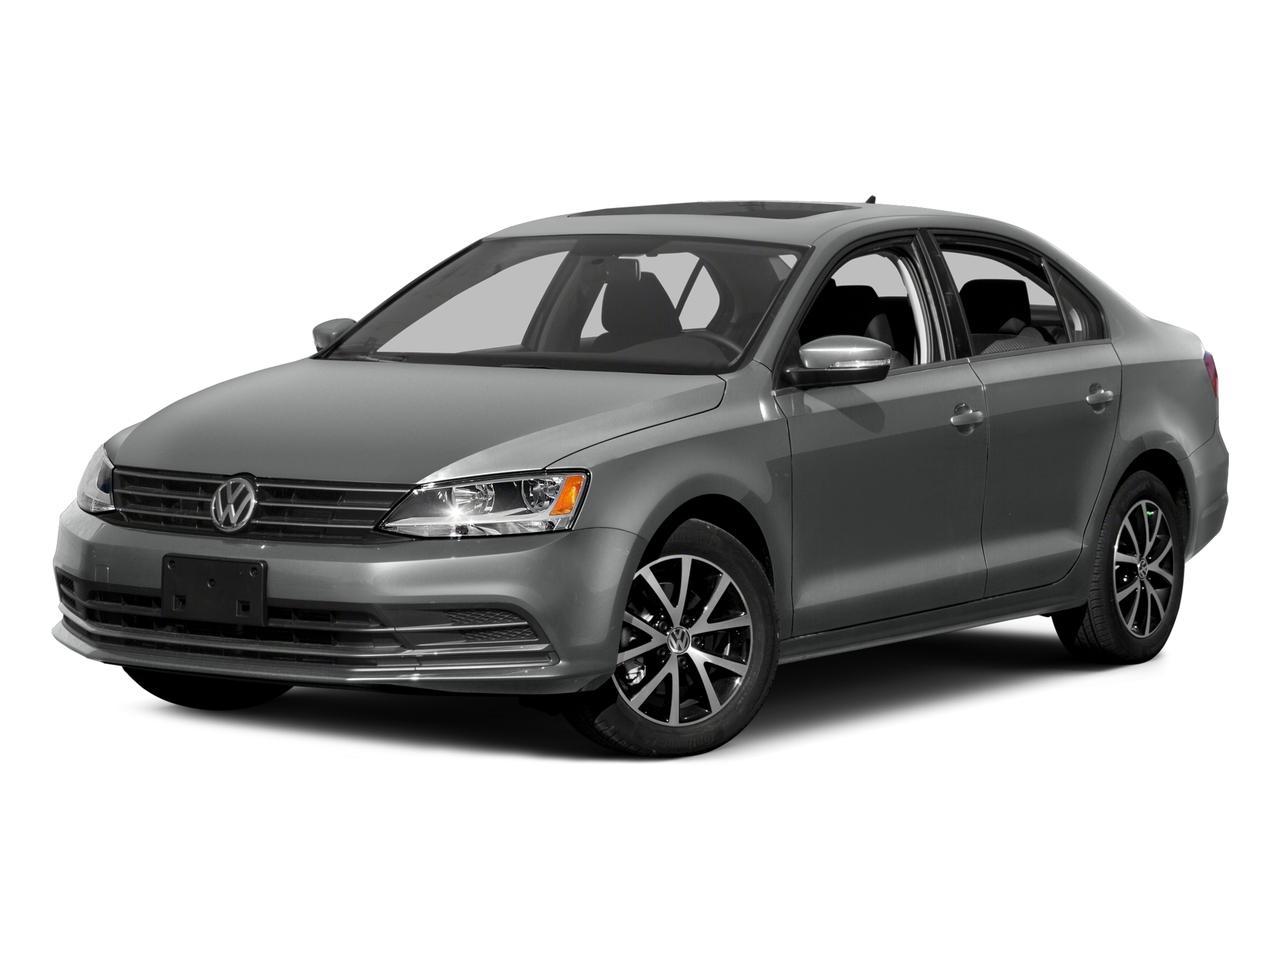 2015 Volkswagen Jetta Sedan Vehicle Photo in Allentown, PA 18103